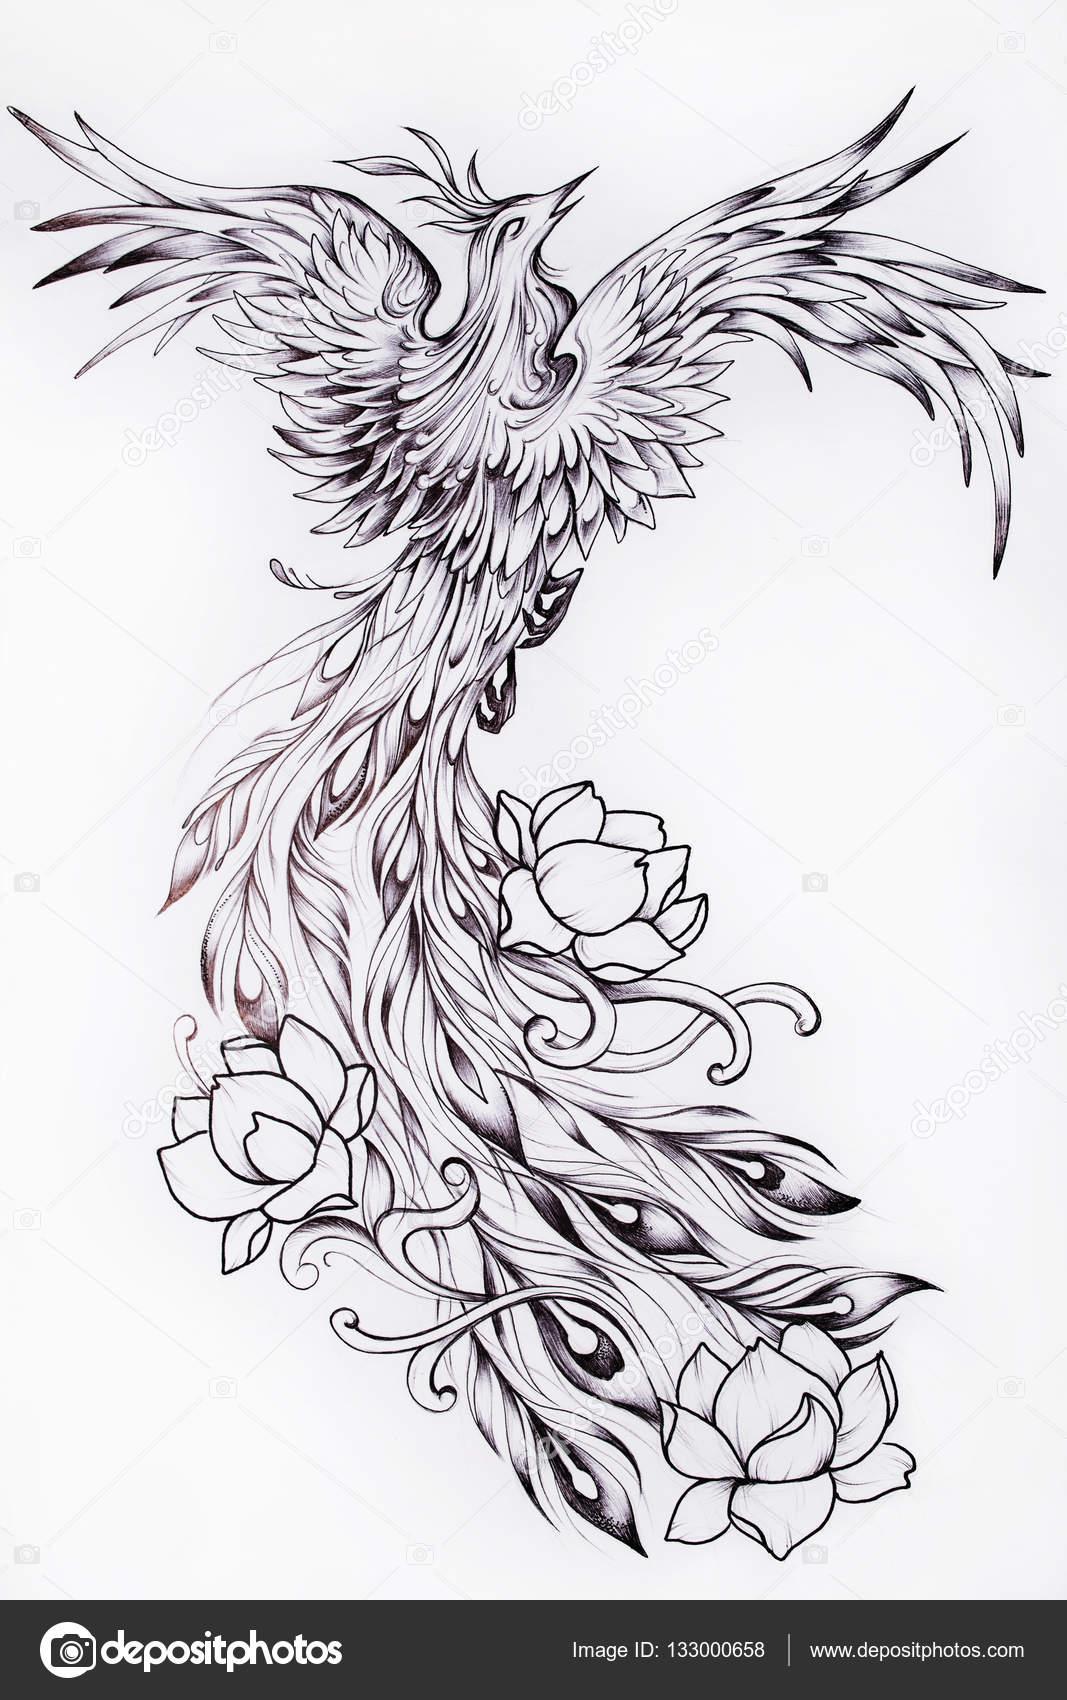 Dibujos: dibujo ave fenix | Boceto blanco y negro de un ave fénix ...